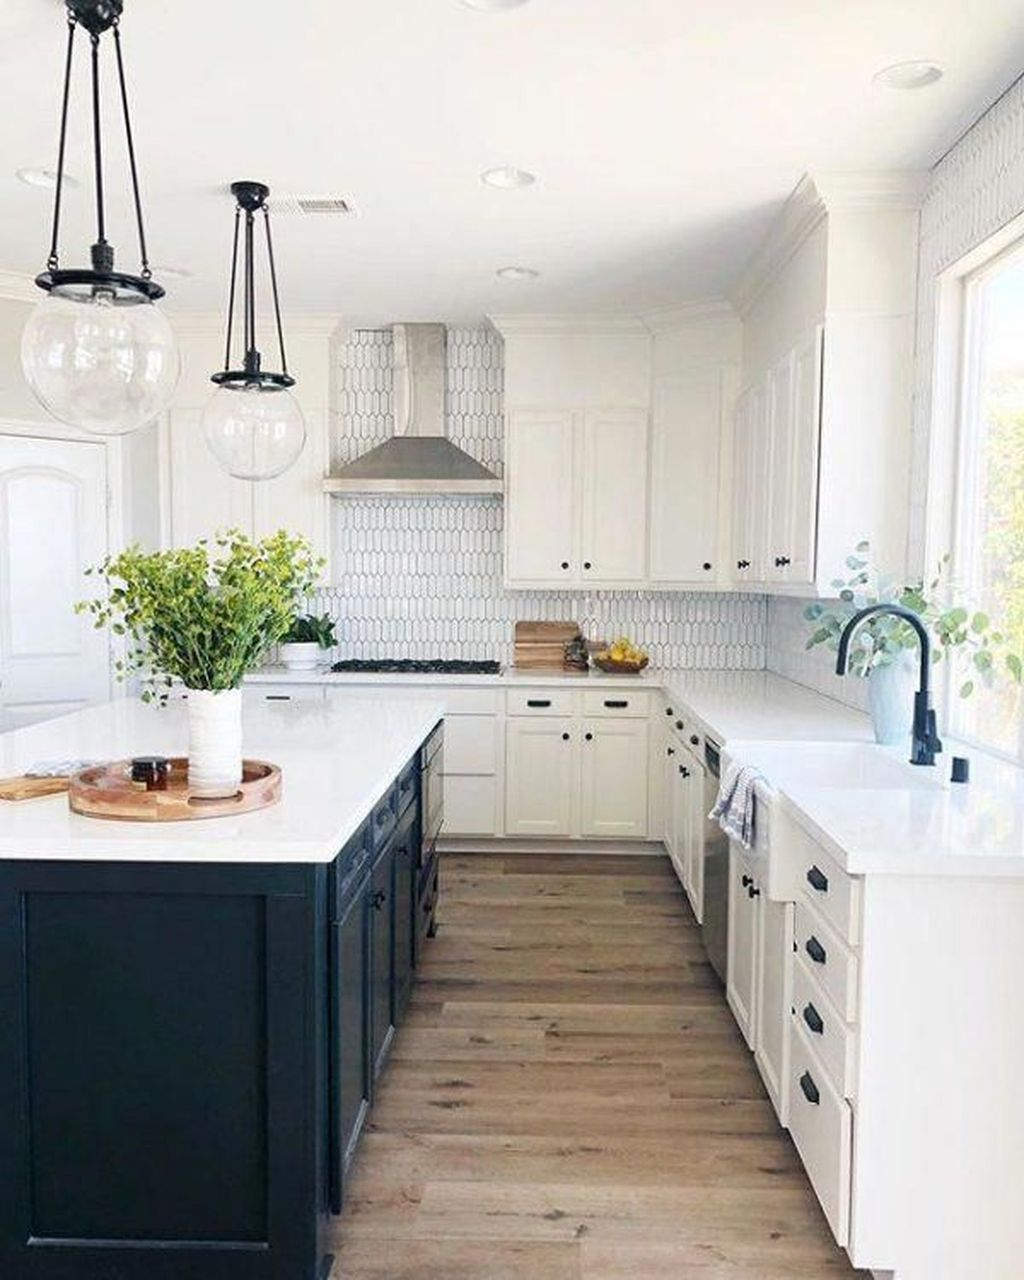 Wonderful Kitchen Lighting Ideas To Make It Look More Beautiful 17